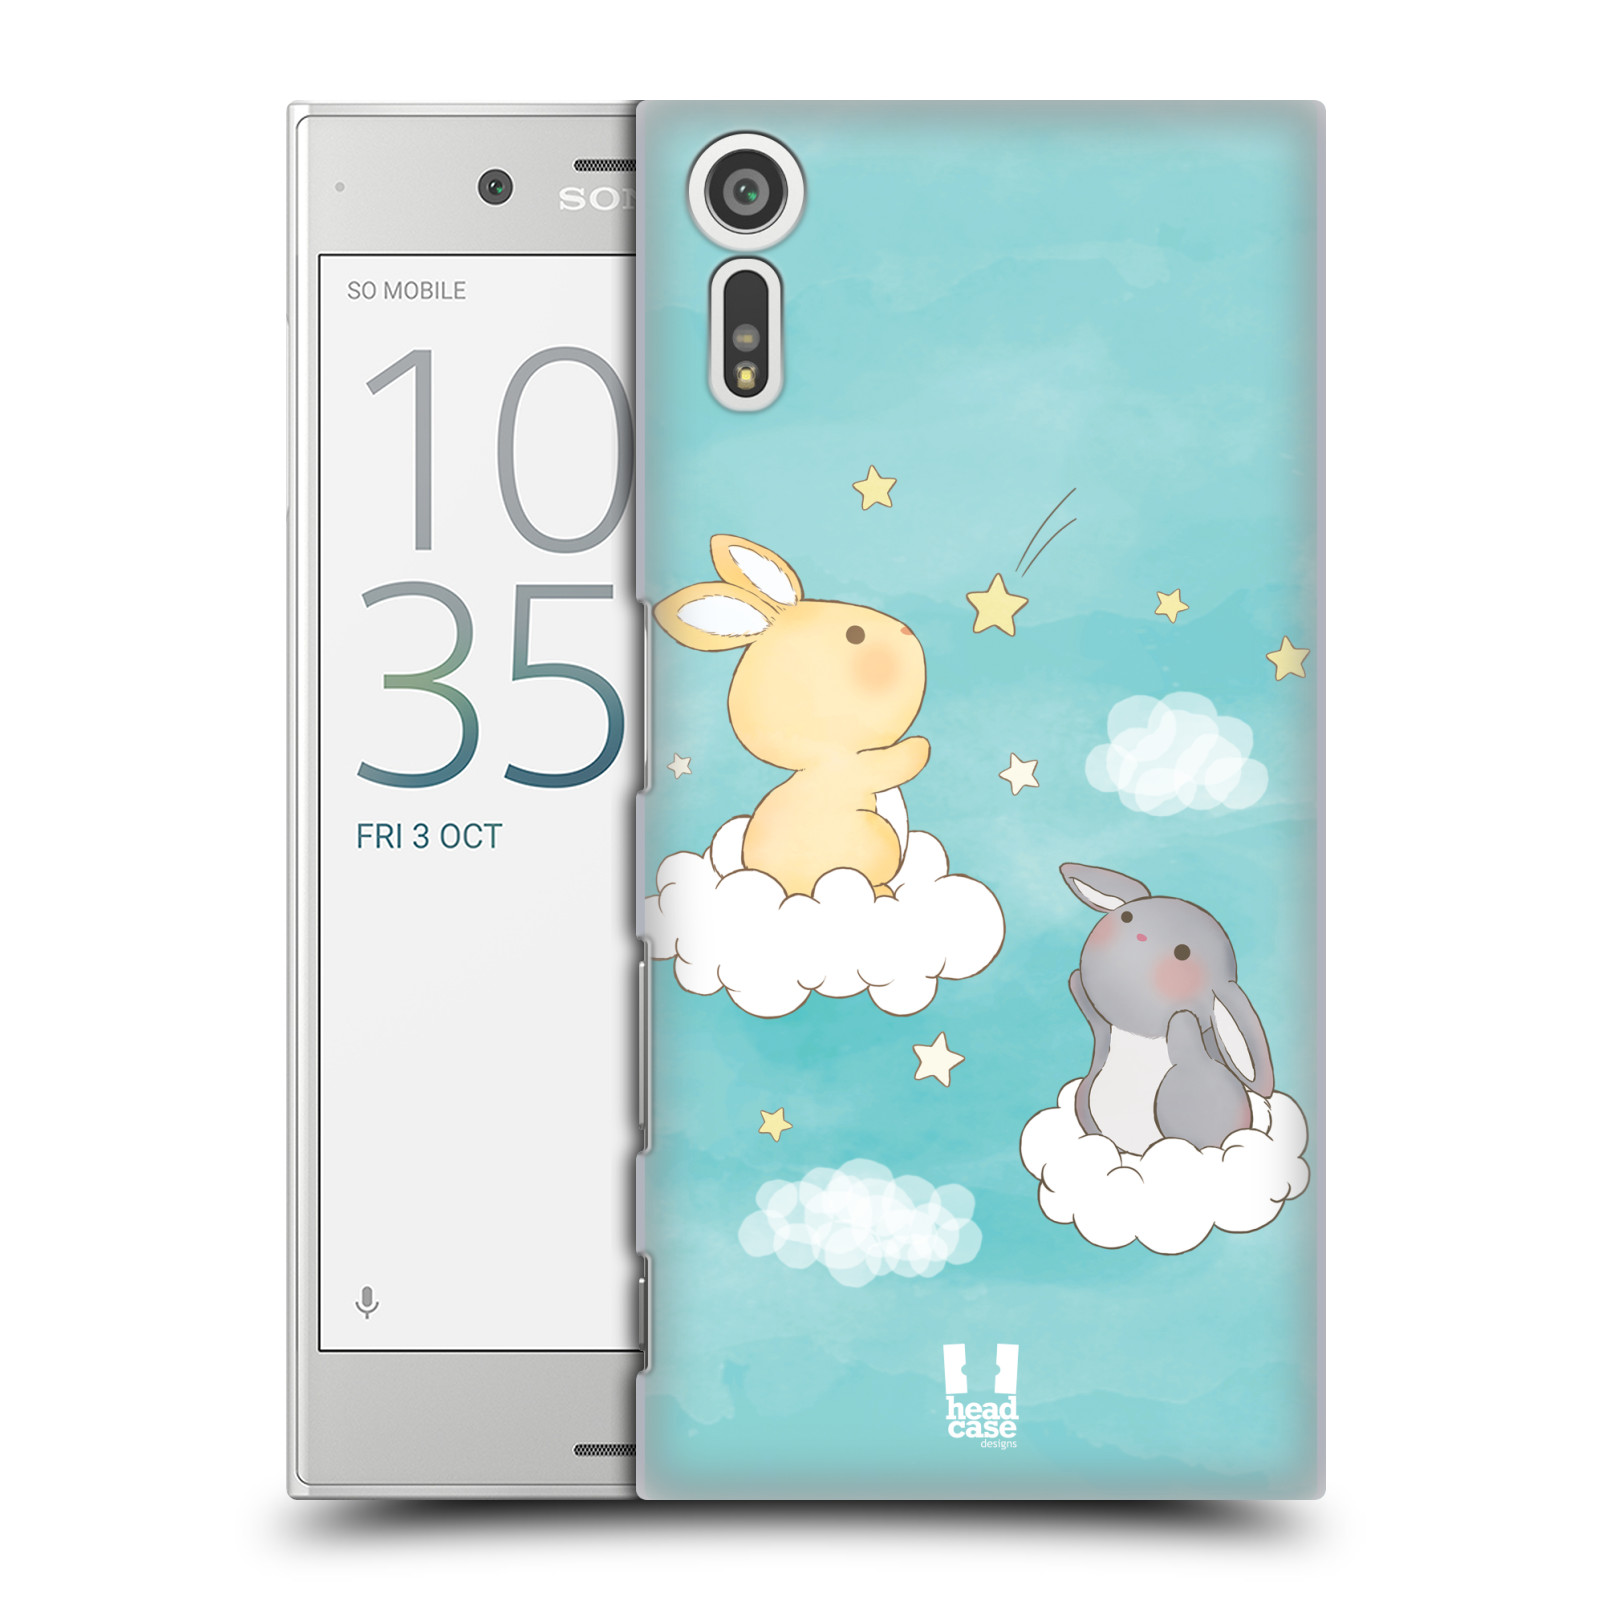 HEAD CASE plastový obal na mobil Sony Xperia XZ vzor králíček a hvězdy modrá